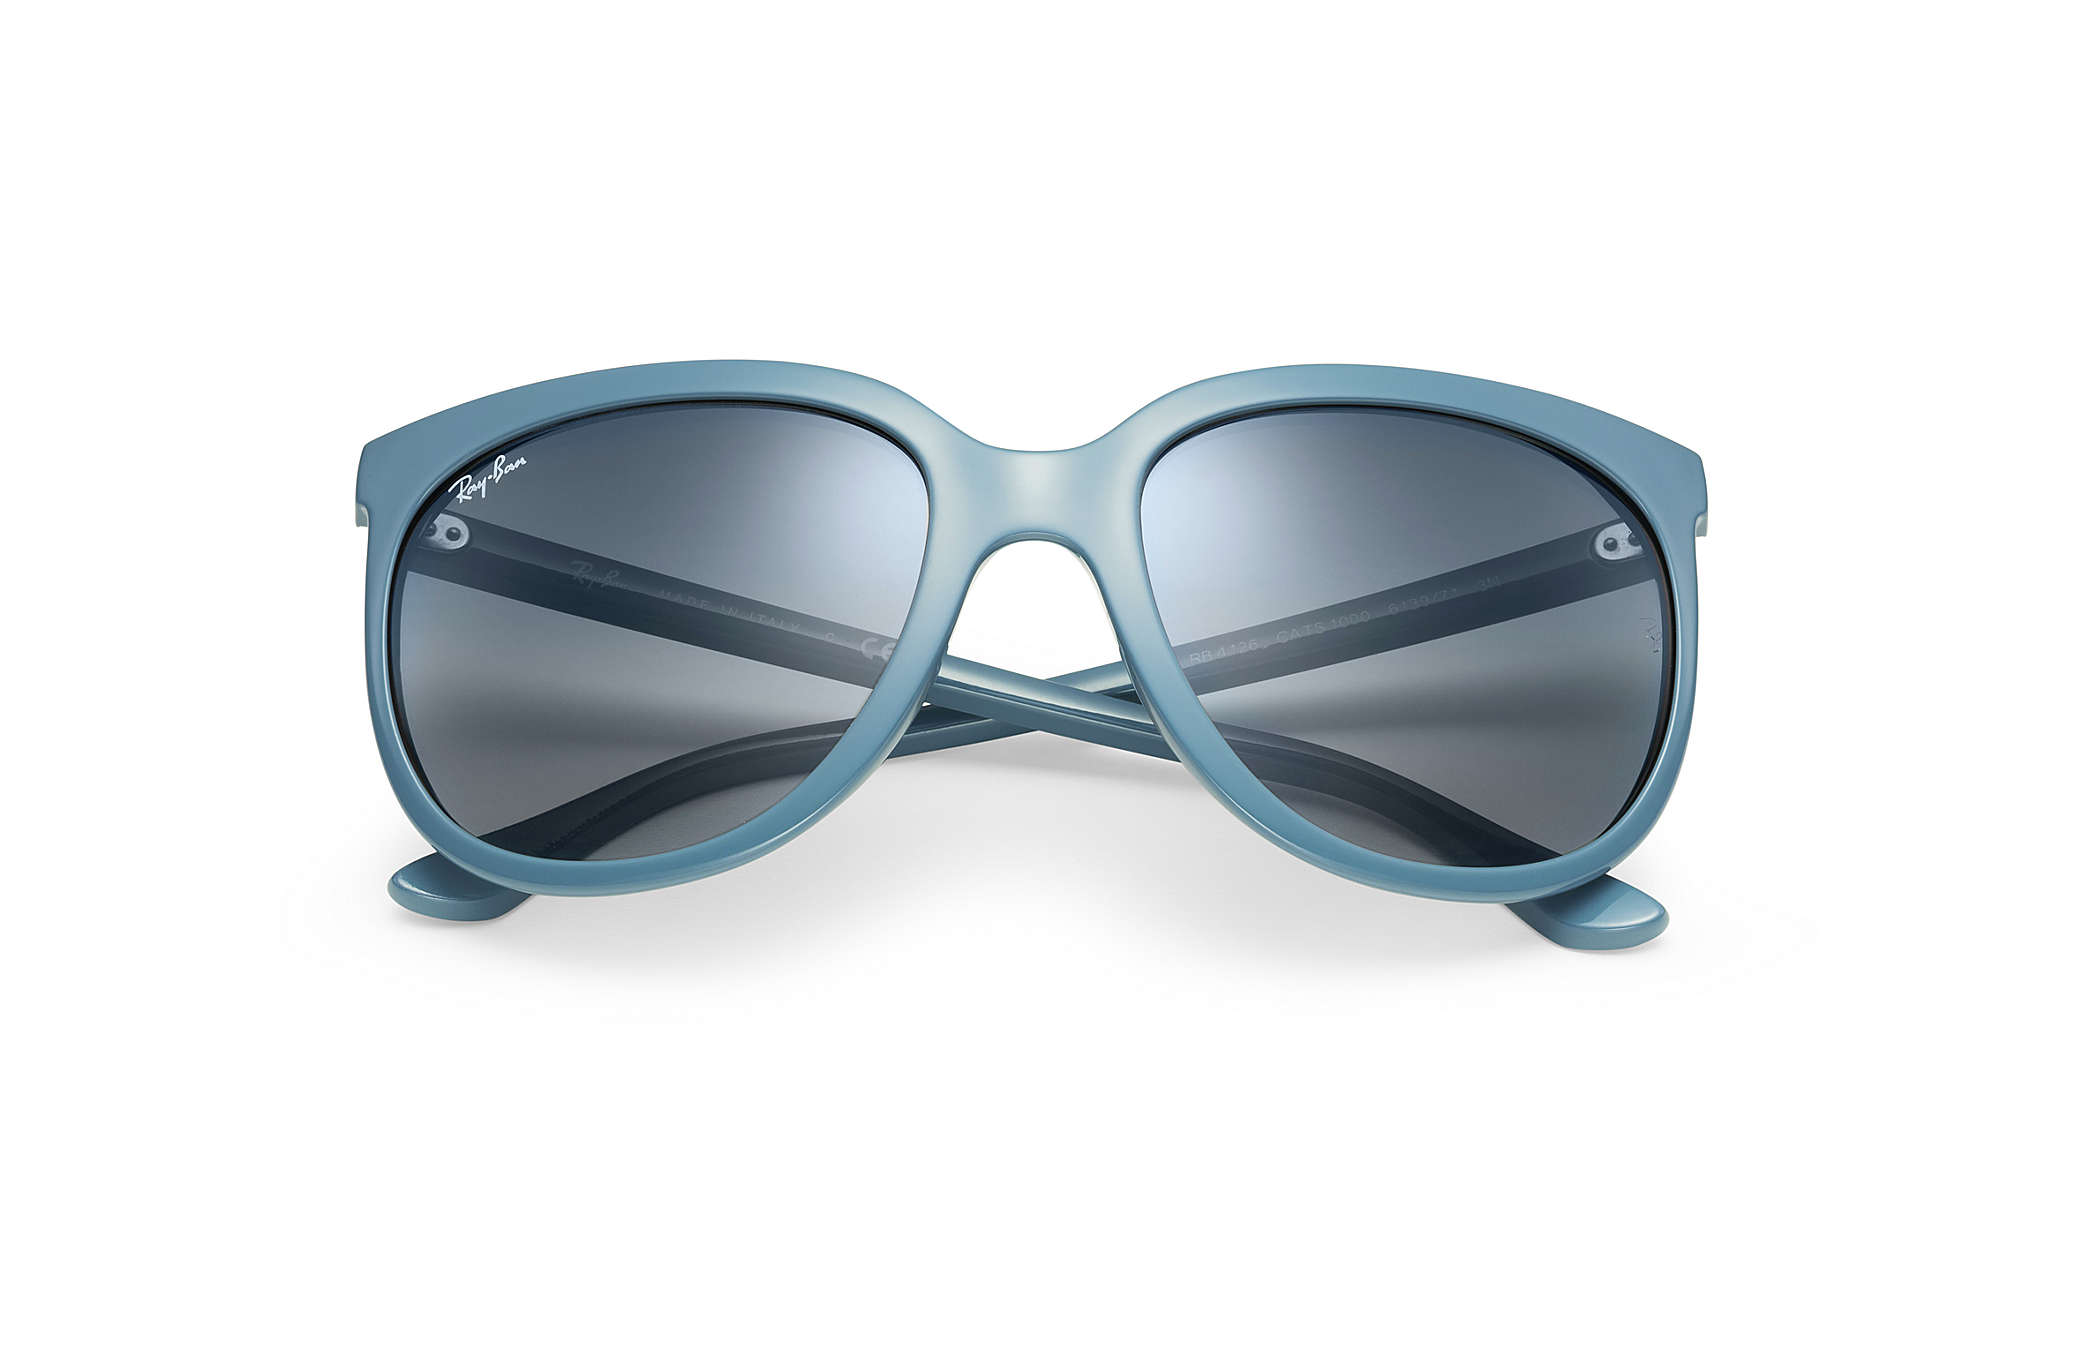 ee79233f31 Ray-Ban Cats 1000 RB4126 Blue - Nylon - Grey Lenses ...